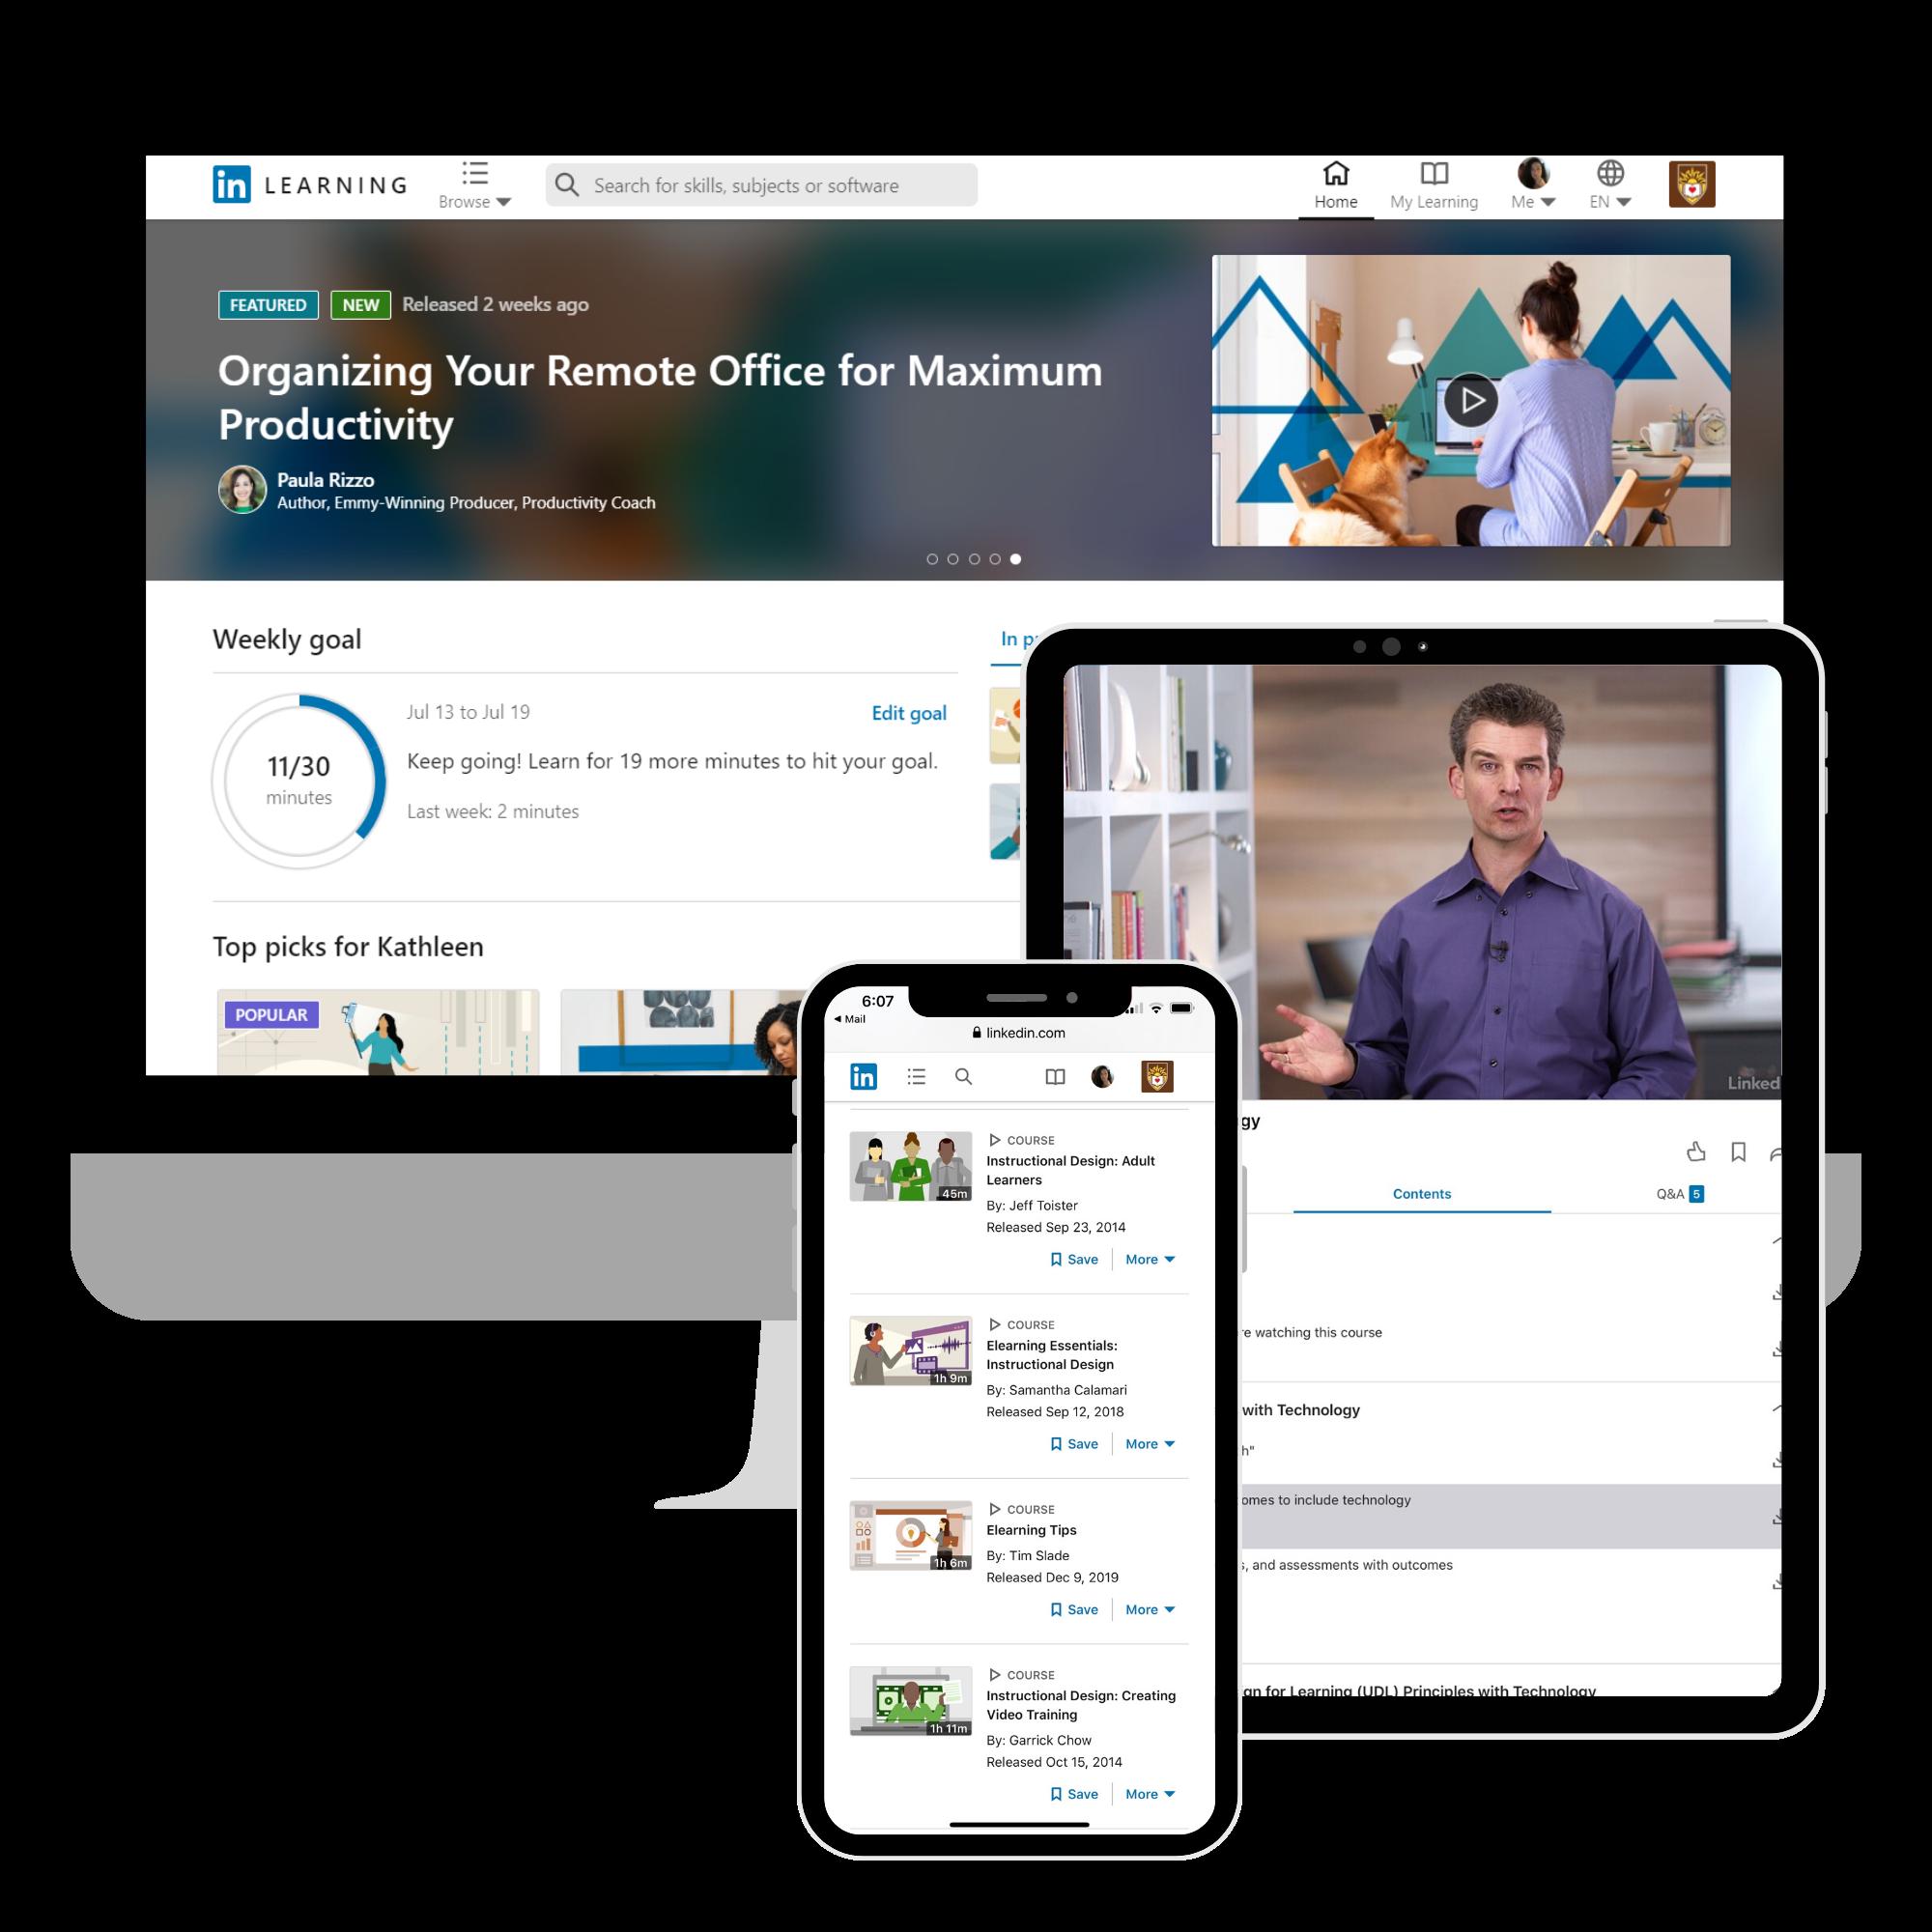 LinkedIn Learning on mobile